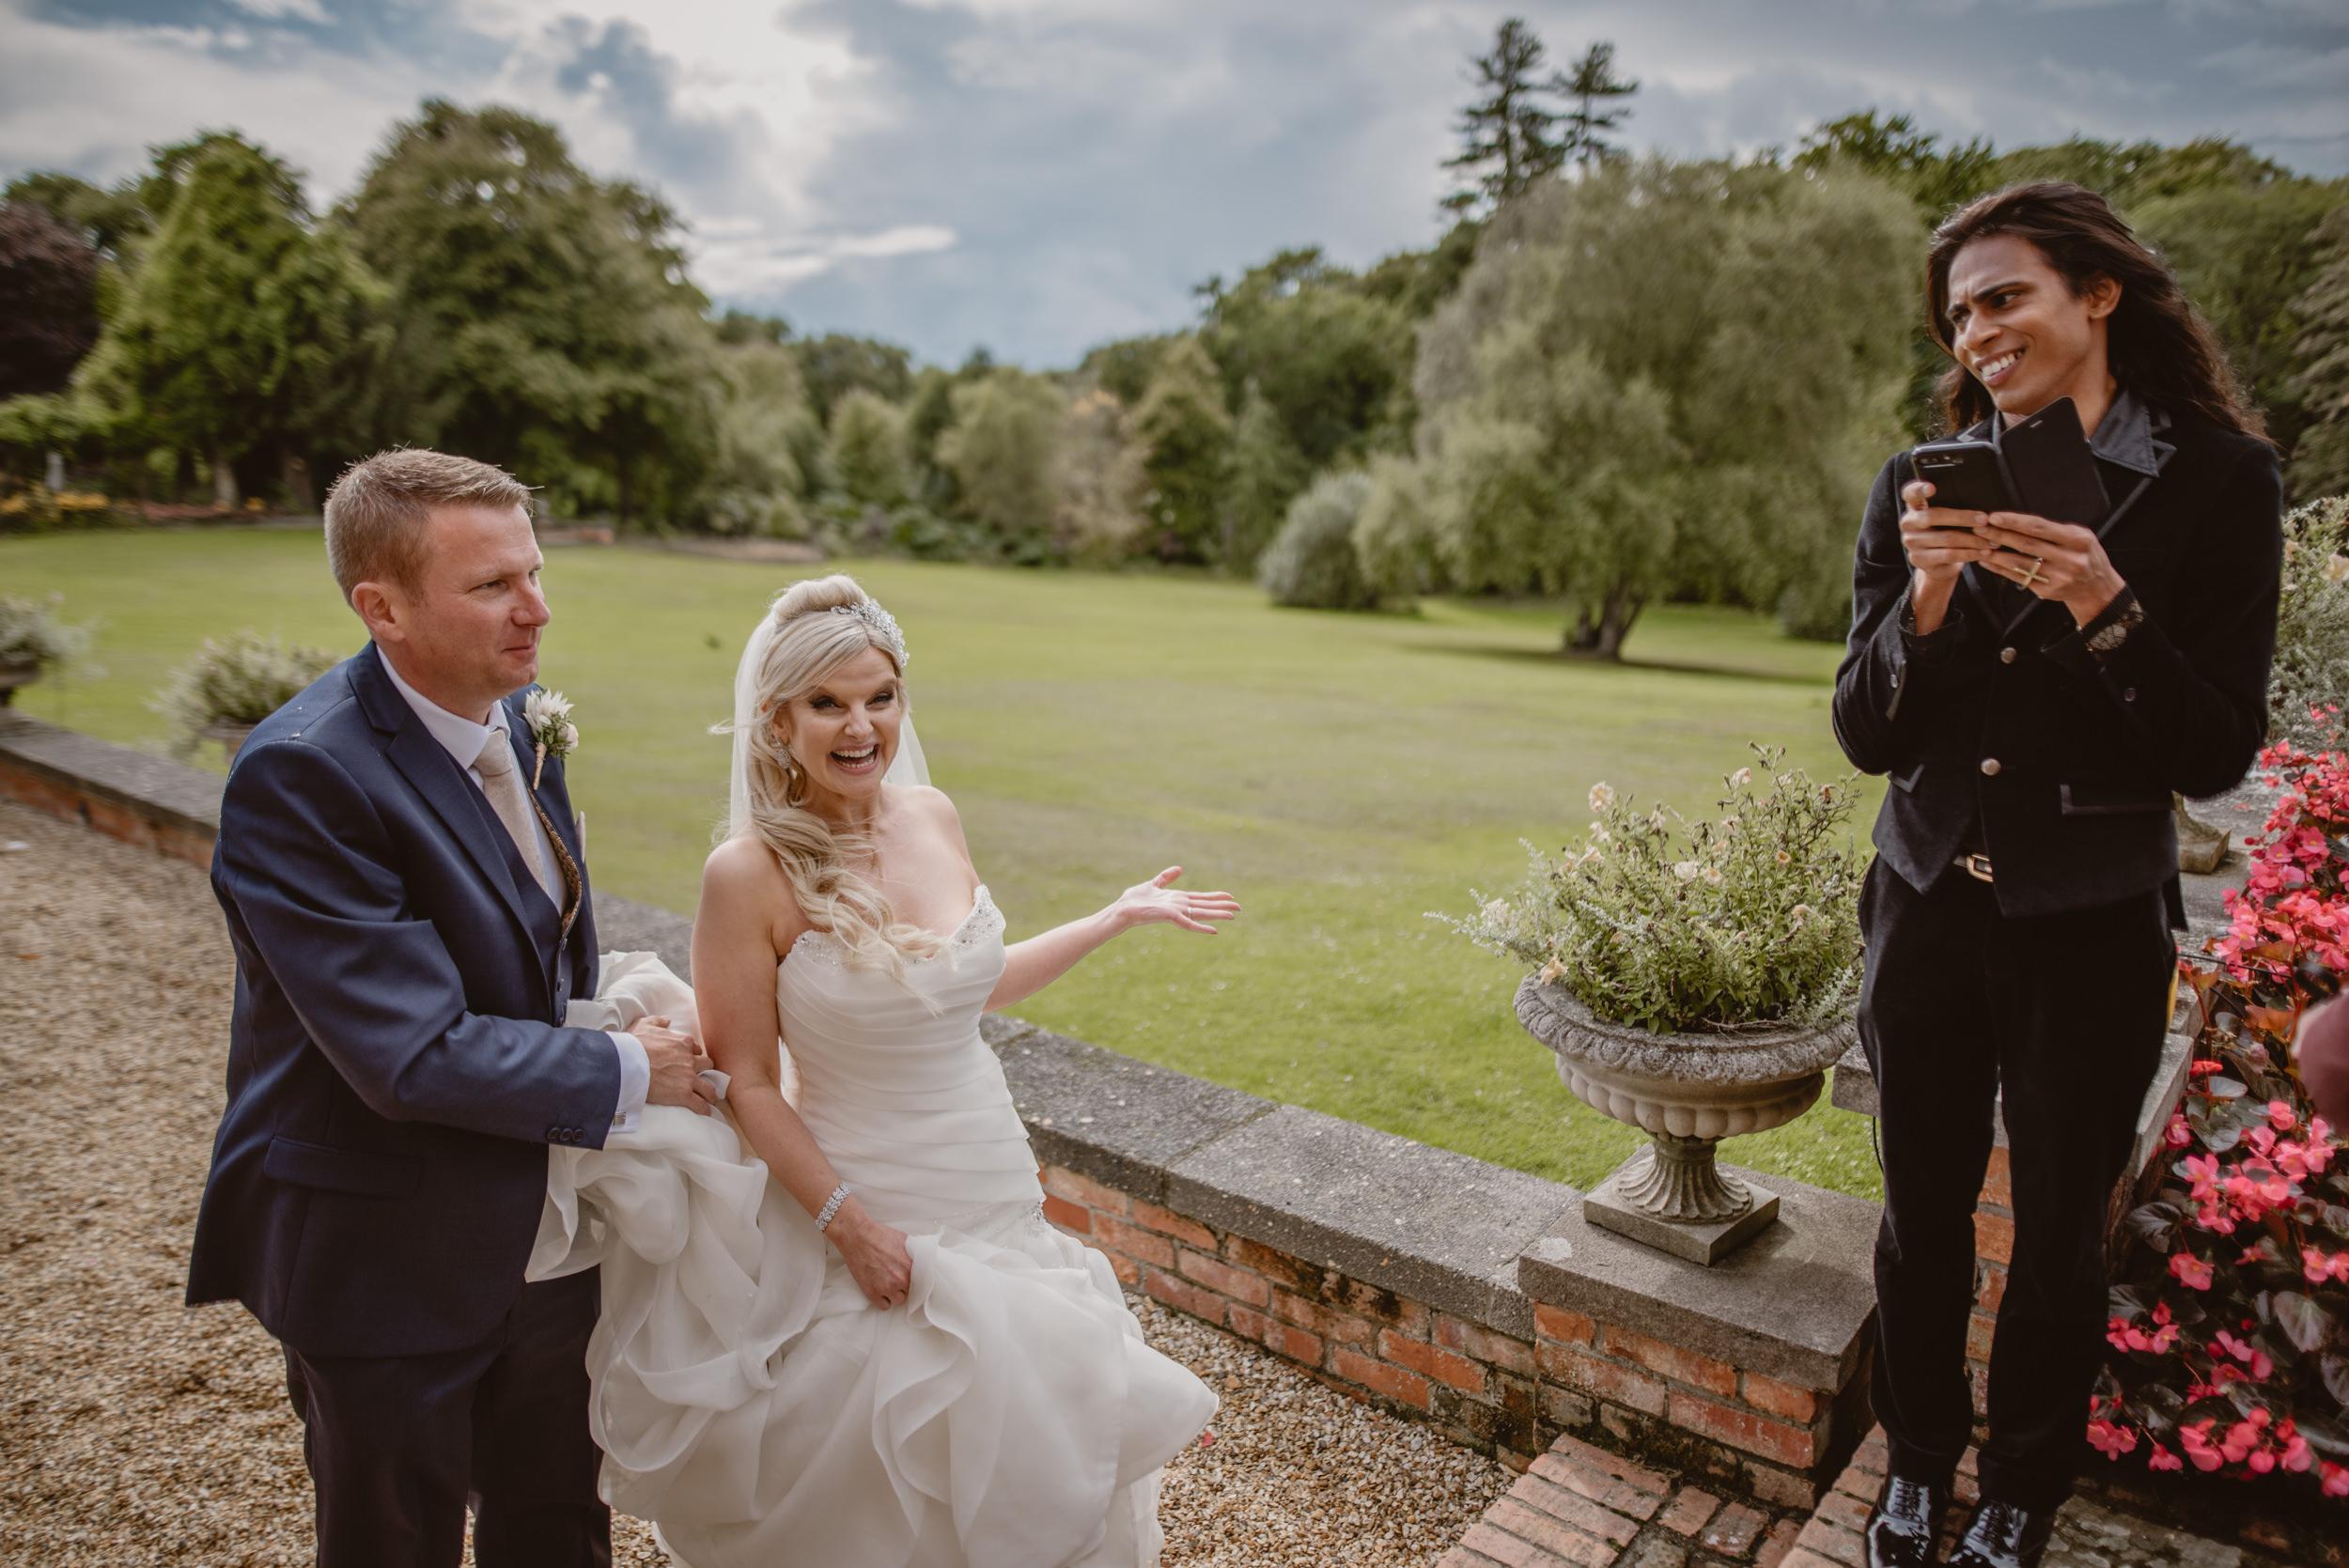 Trisha-and-Roger-wedding-The-Priory-Church-and-Chewton-Glen-Hotel-Christchurch-Manu-Mendoza-Wedding-Photography-329.jpg